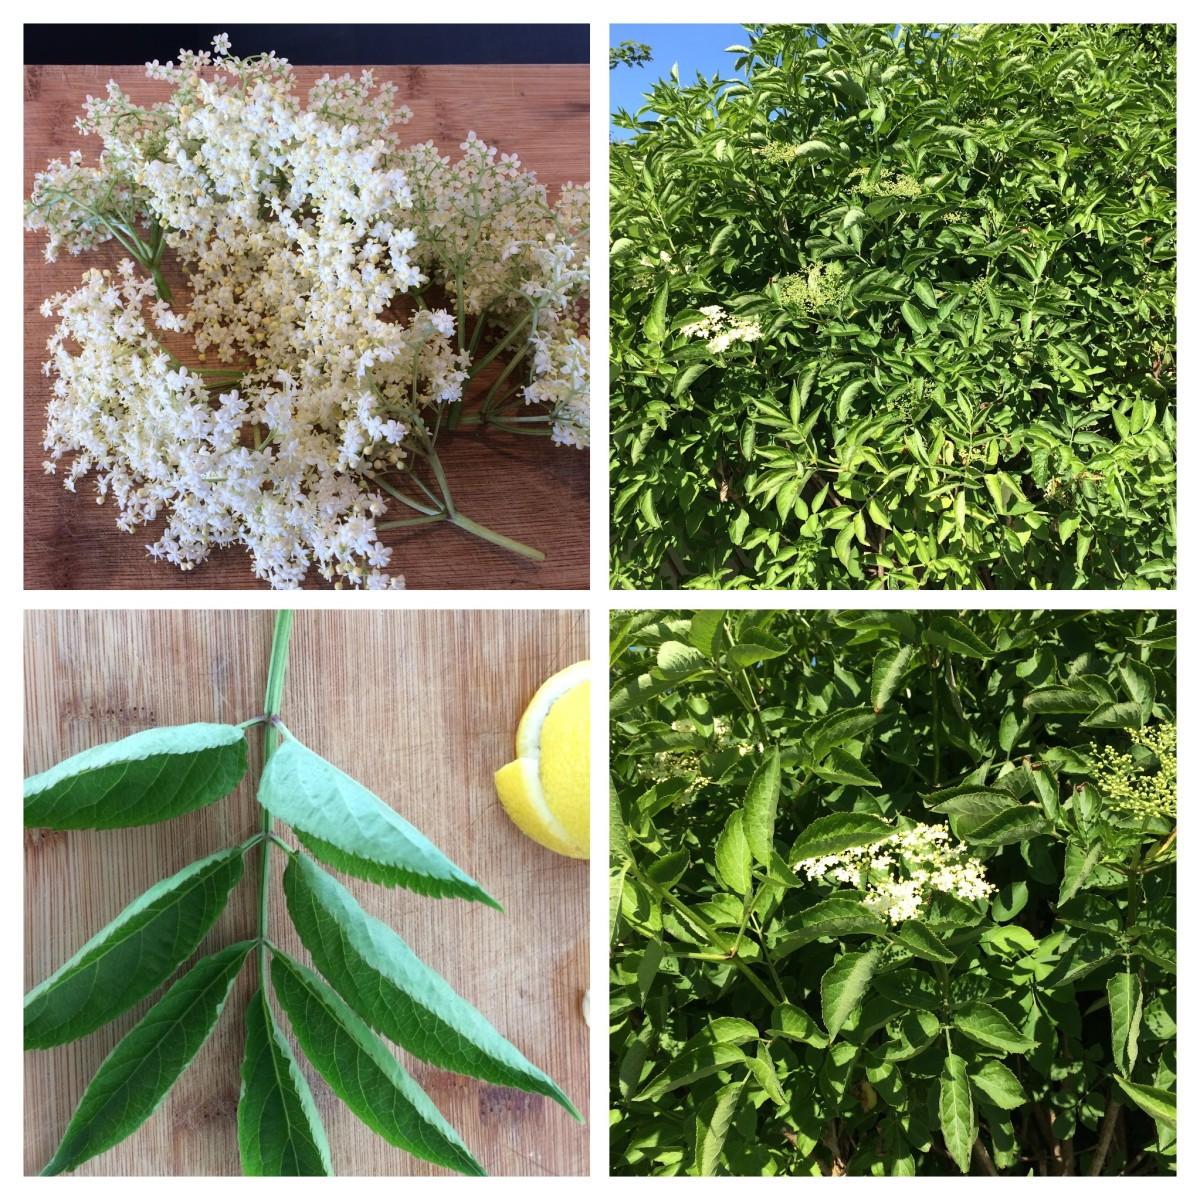 How to Make Elderflower Cordial: A Refreshing Summer Drink